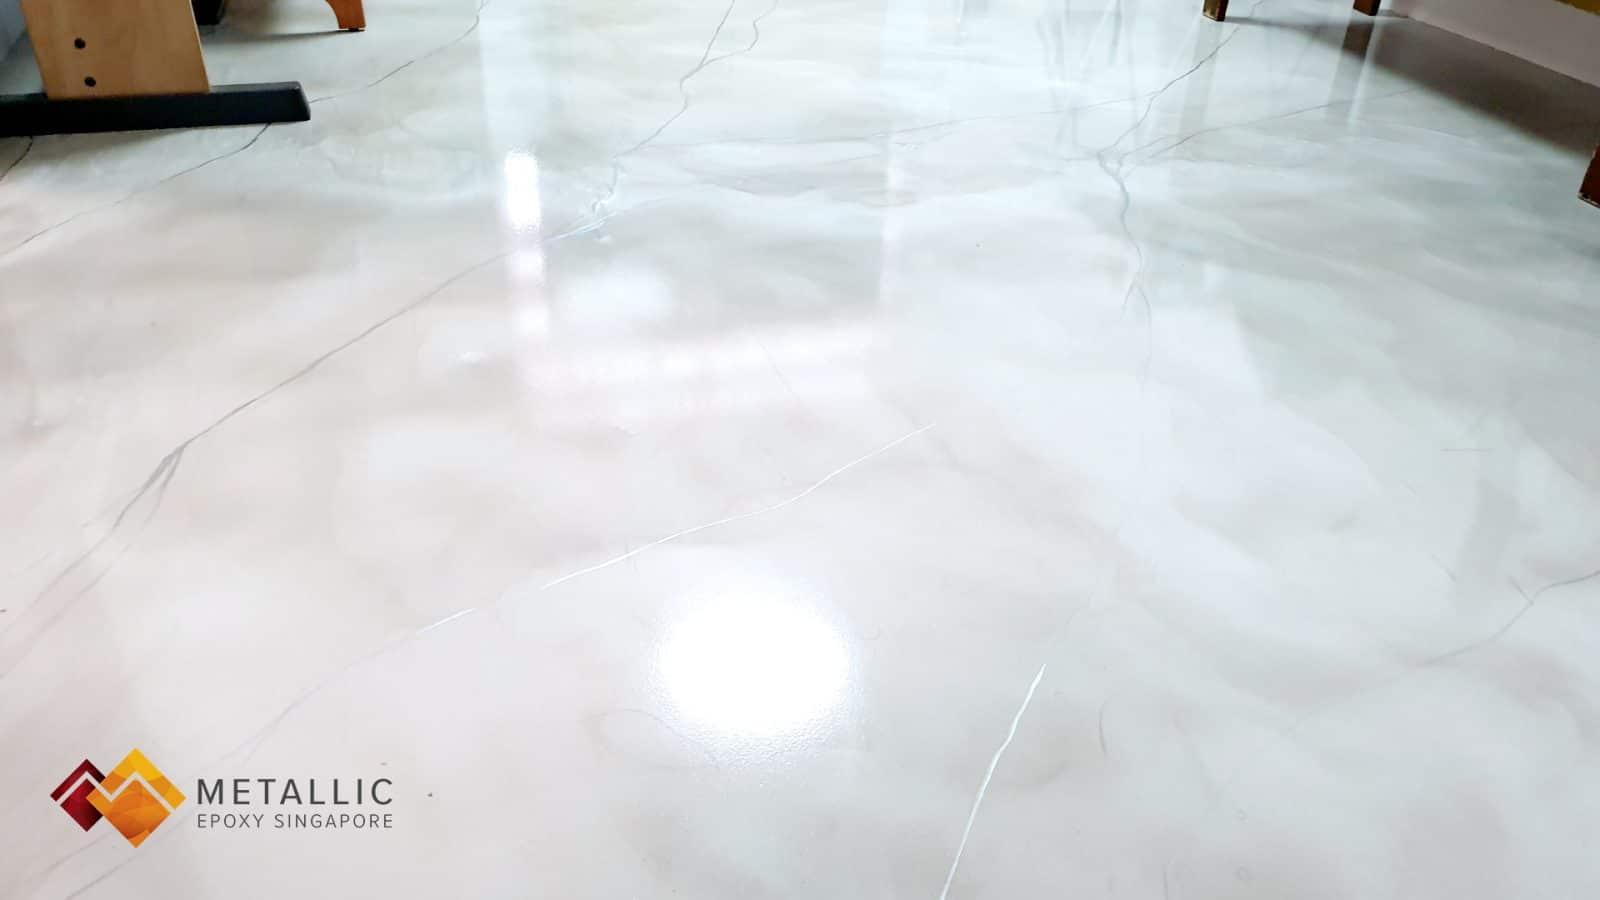 metallic epoxy singapore silver khaki bedroom living room floor